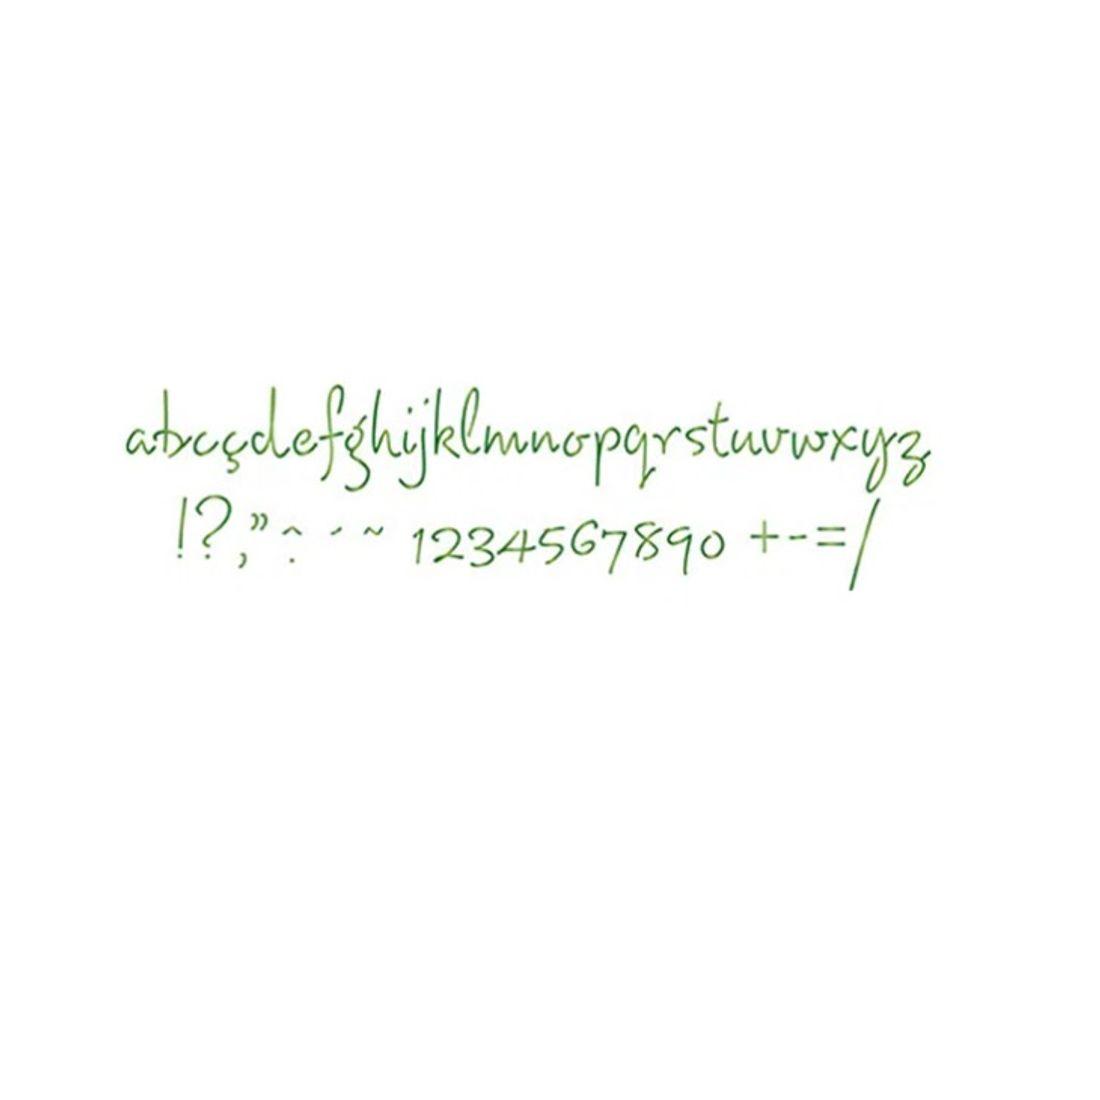 36604_1952